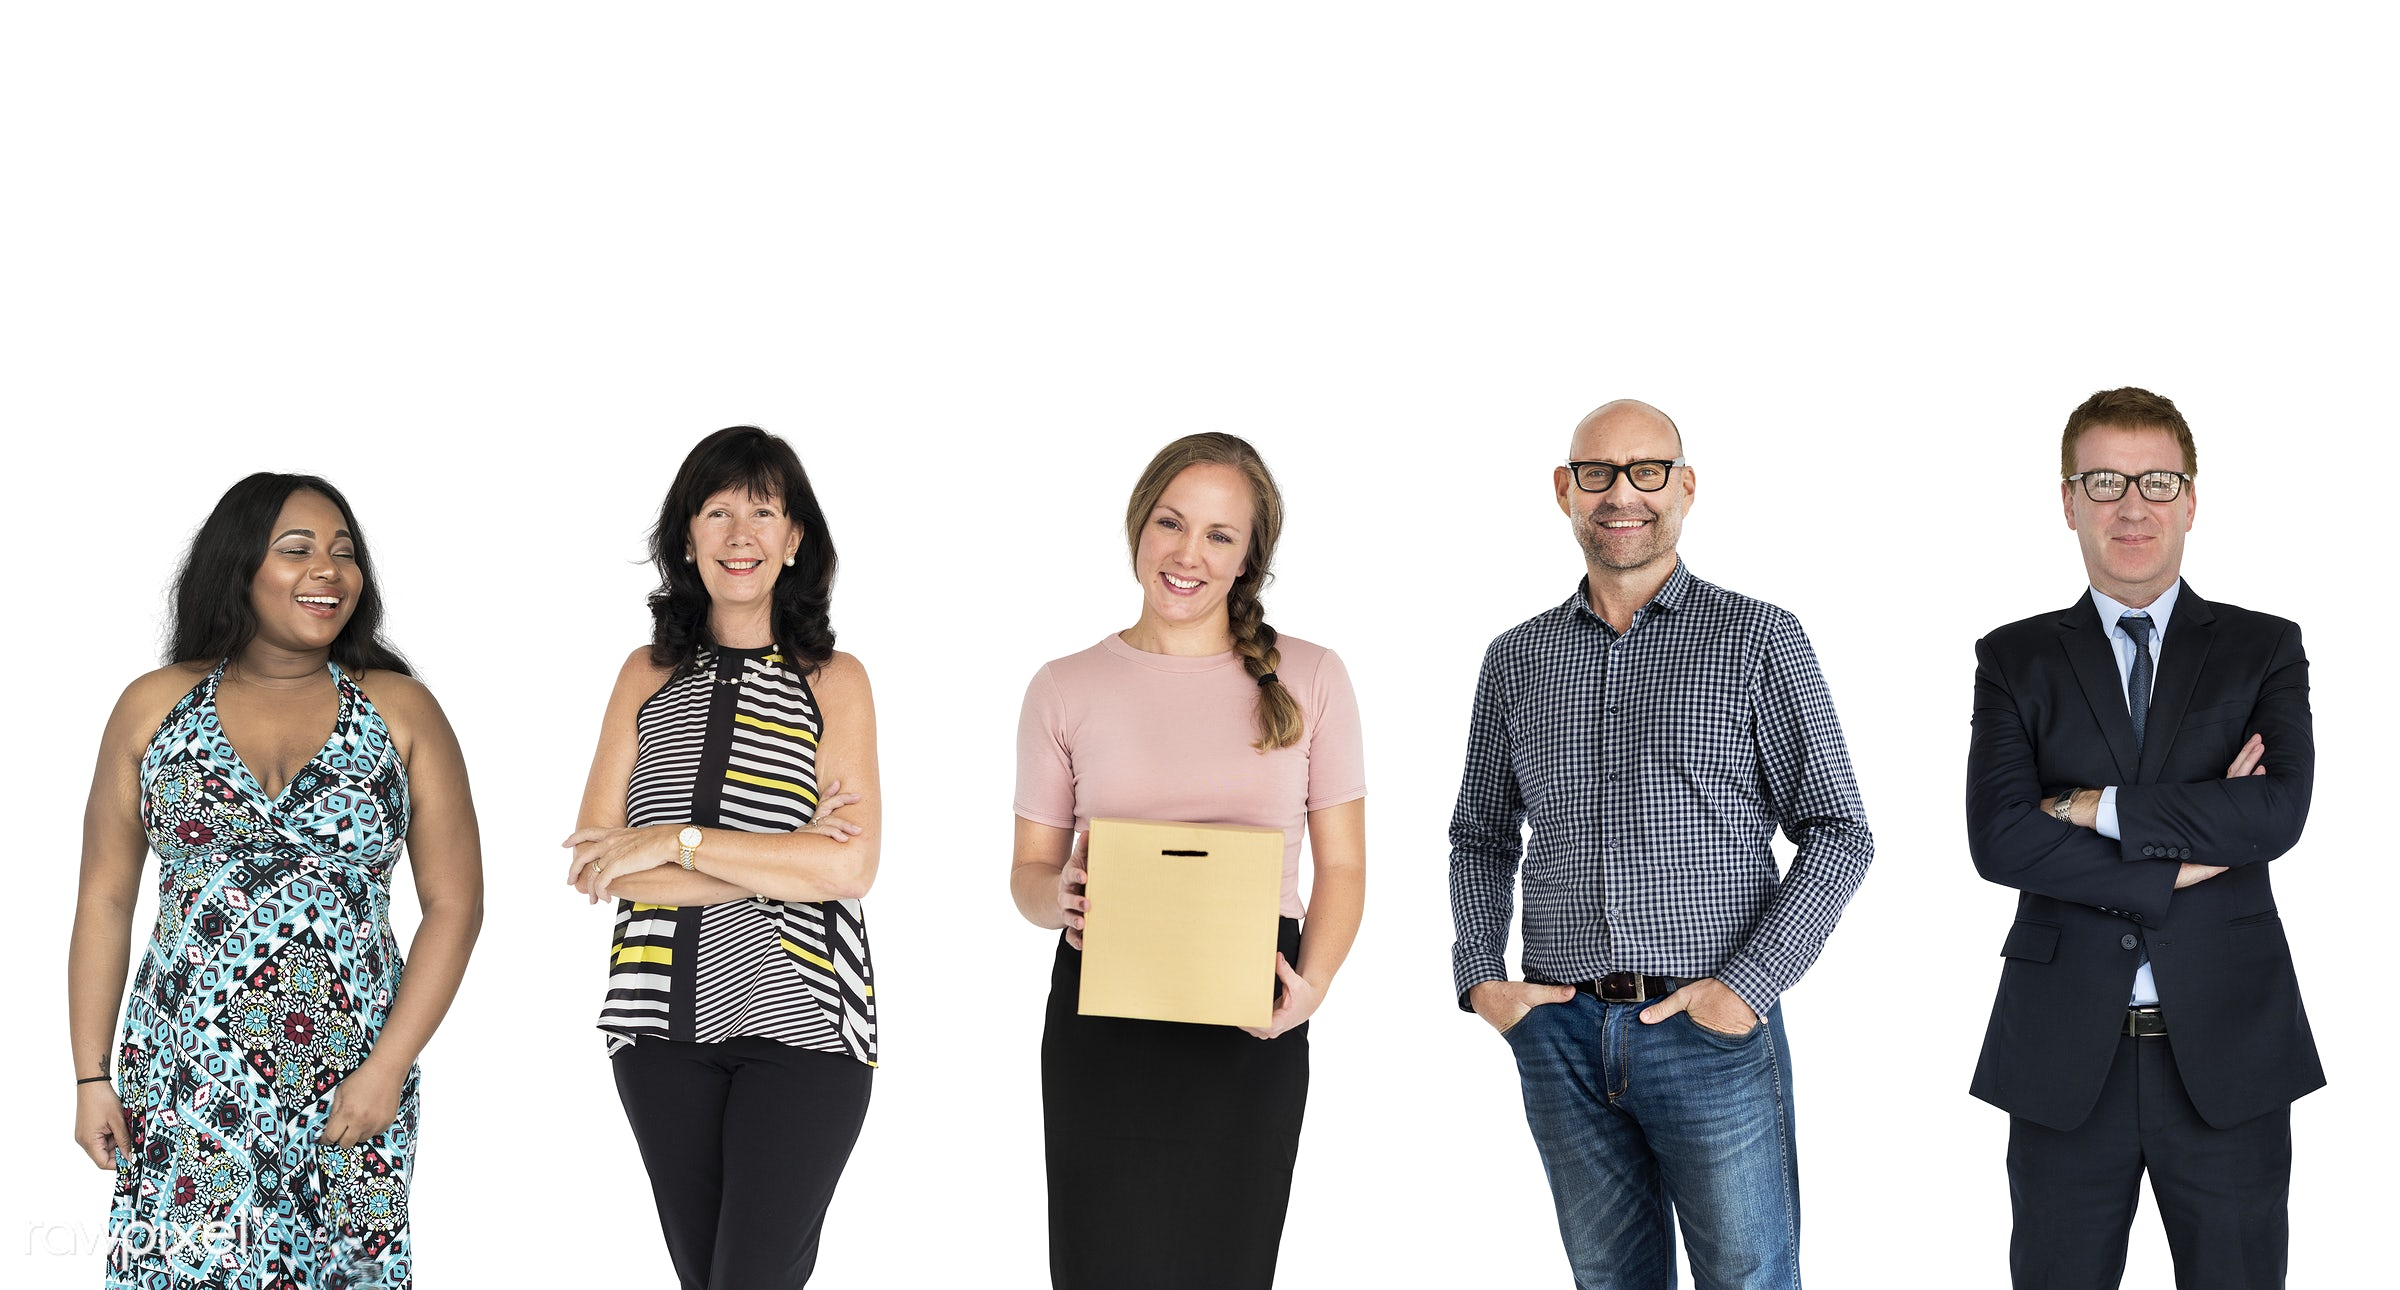 Diverse people set - adult, business, businessman, businessmen, businesswoman, businesswomen, career, cheerful, collection,...